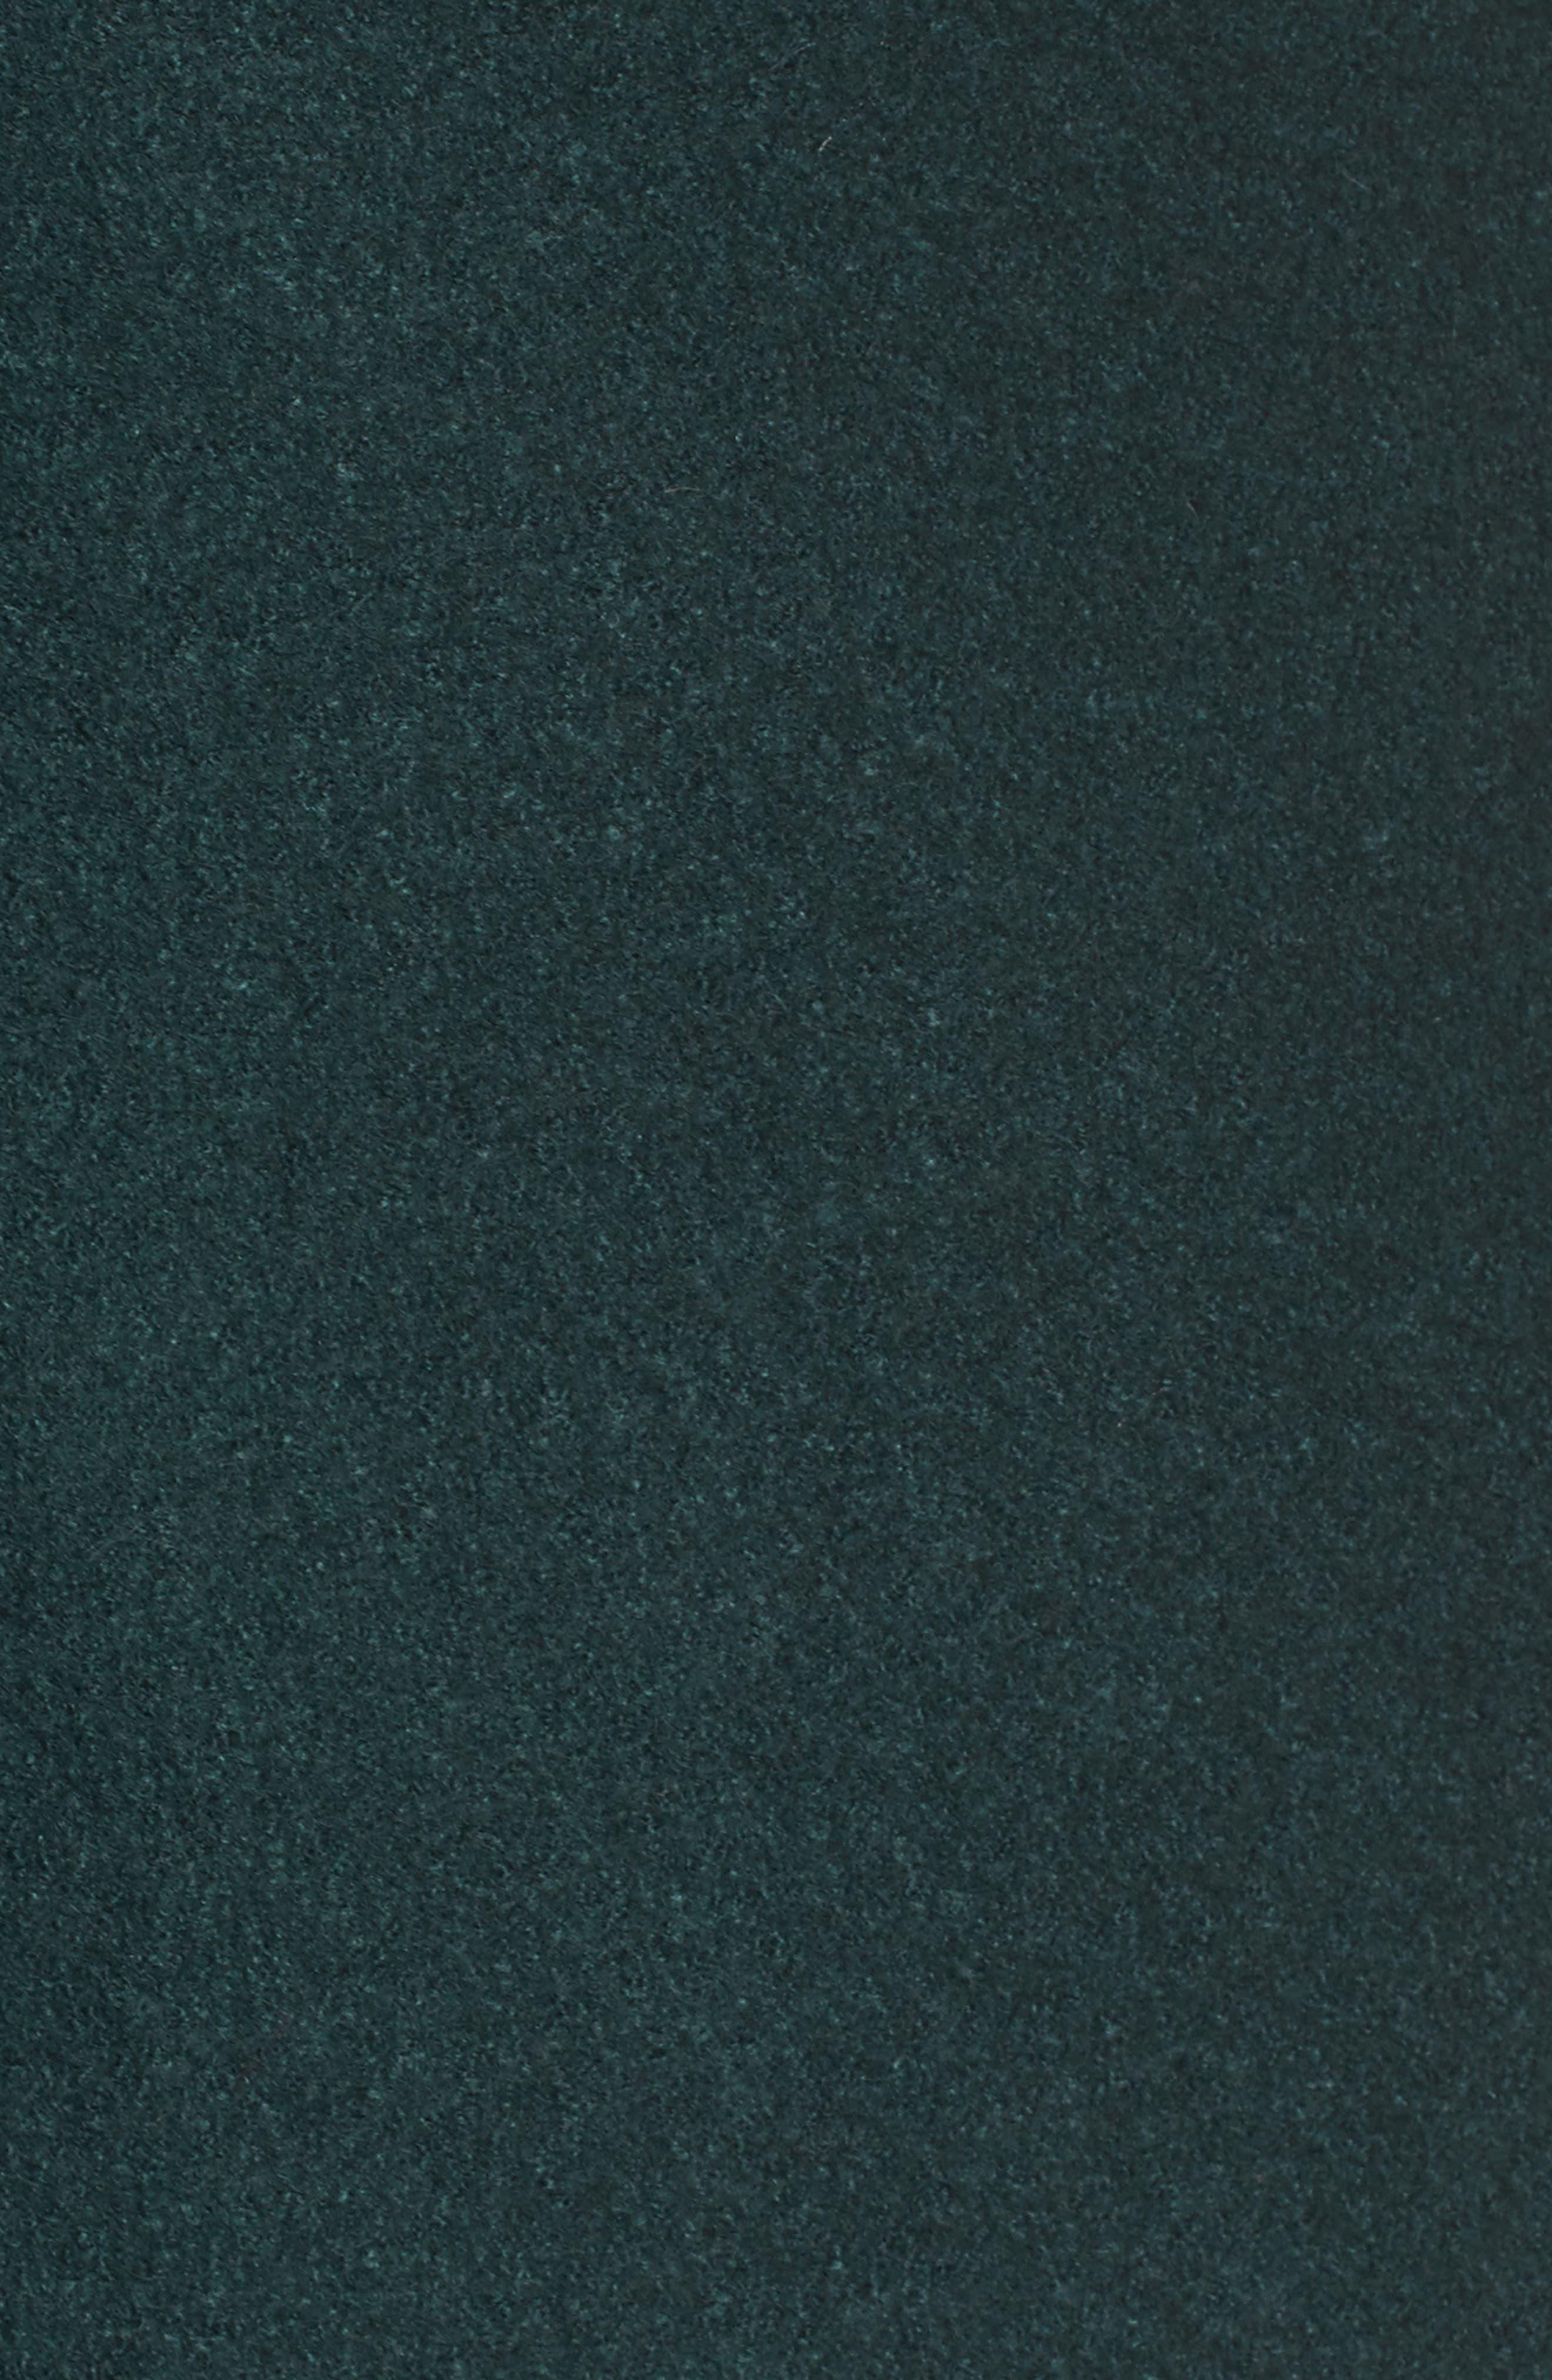 Asymmetrical Zip Boiled Wool Blend Coat,                             Alternate thumbnail 5, color,                             Green Ponderosa